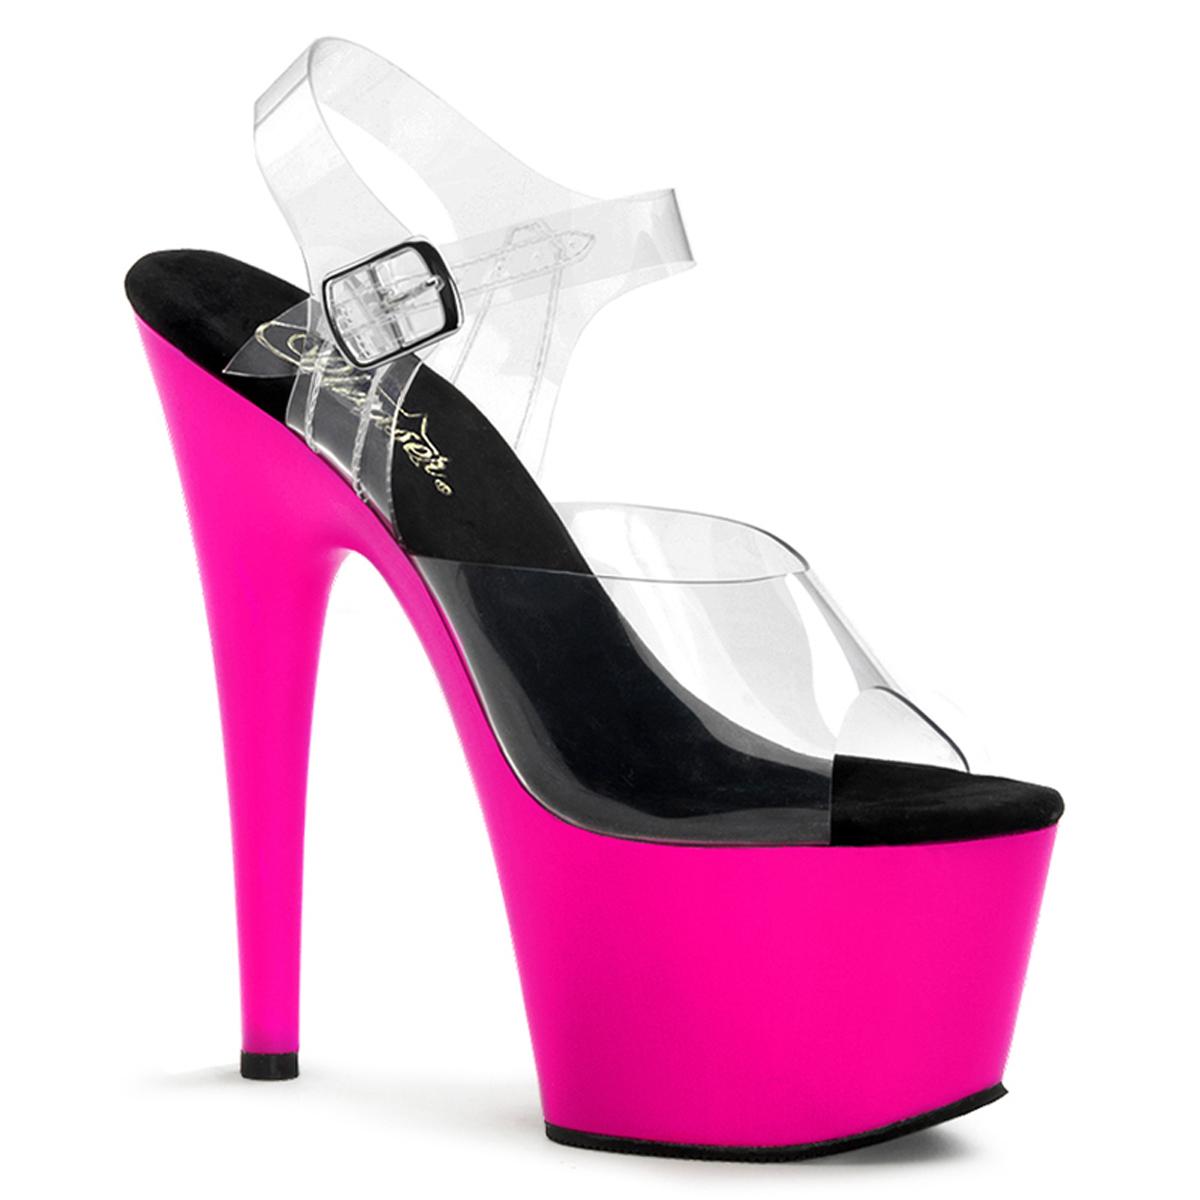 High 708uv Neon Plateau Adore Pink Heels W2EDIHY9